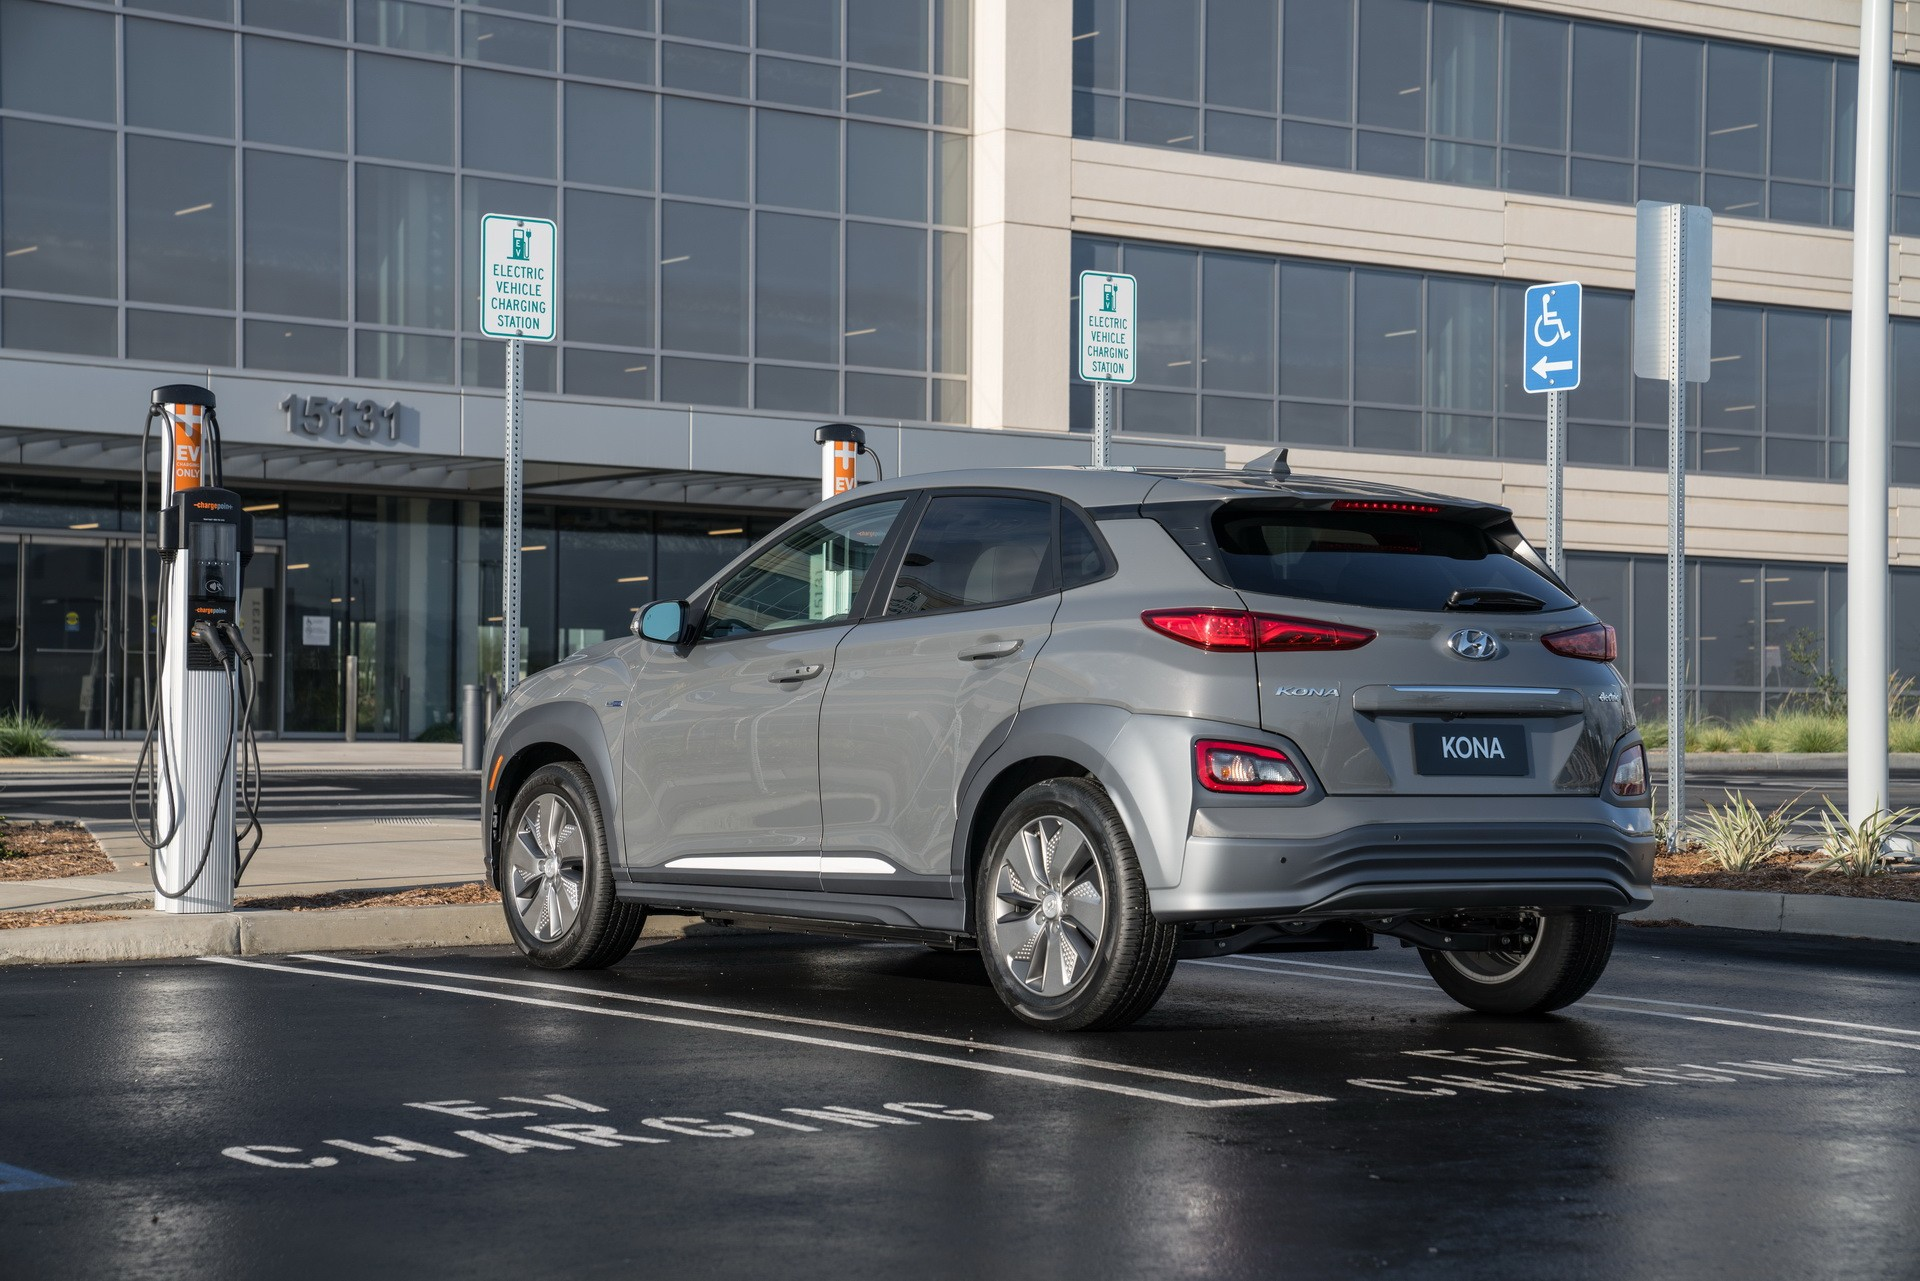 U S 2019 Hyundai Kona Electric Available In Three Trim Levels